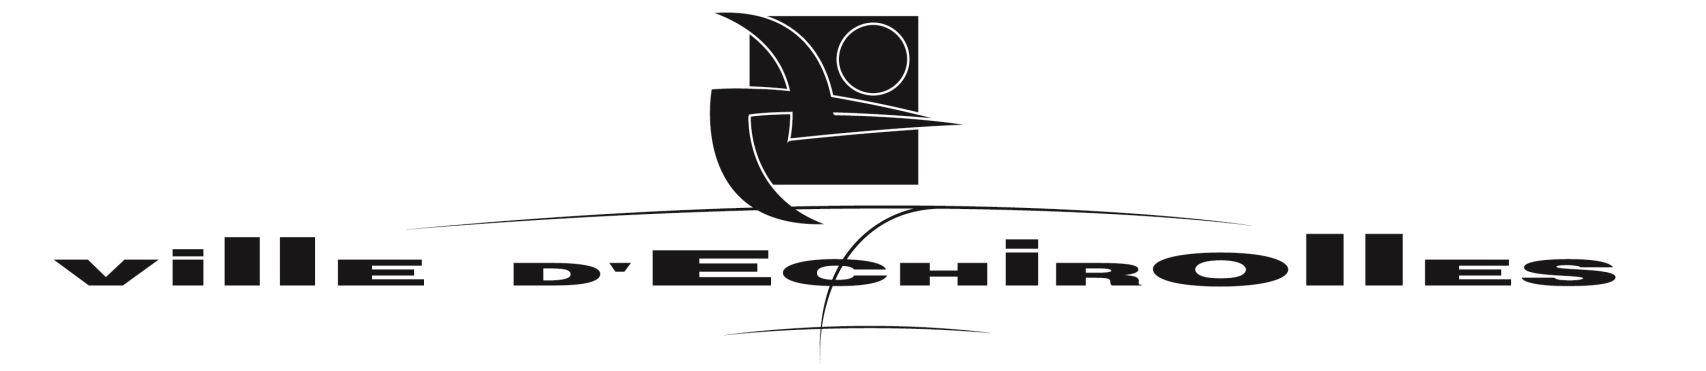 logo echi2